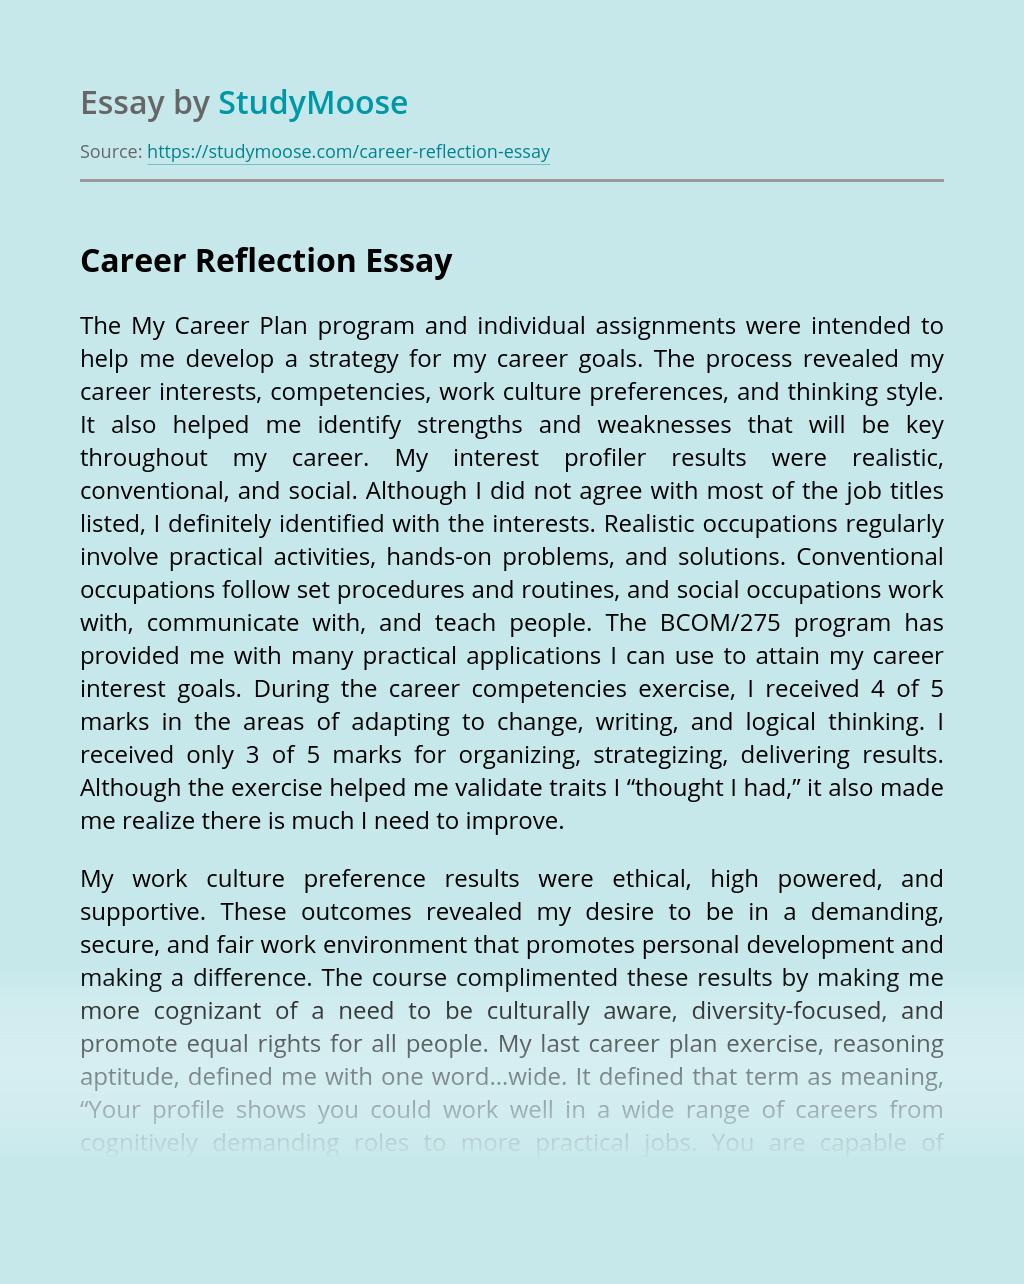 Career Reflection